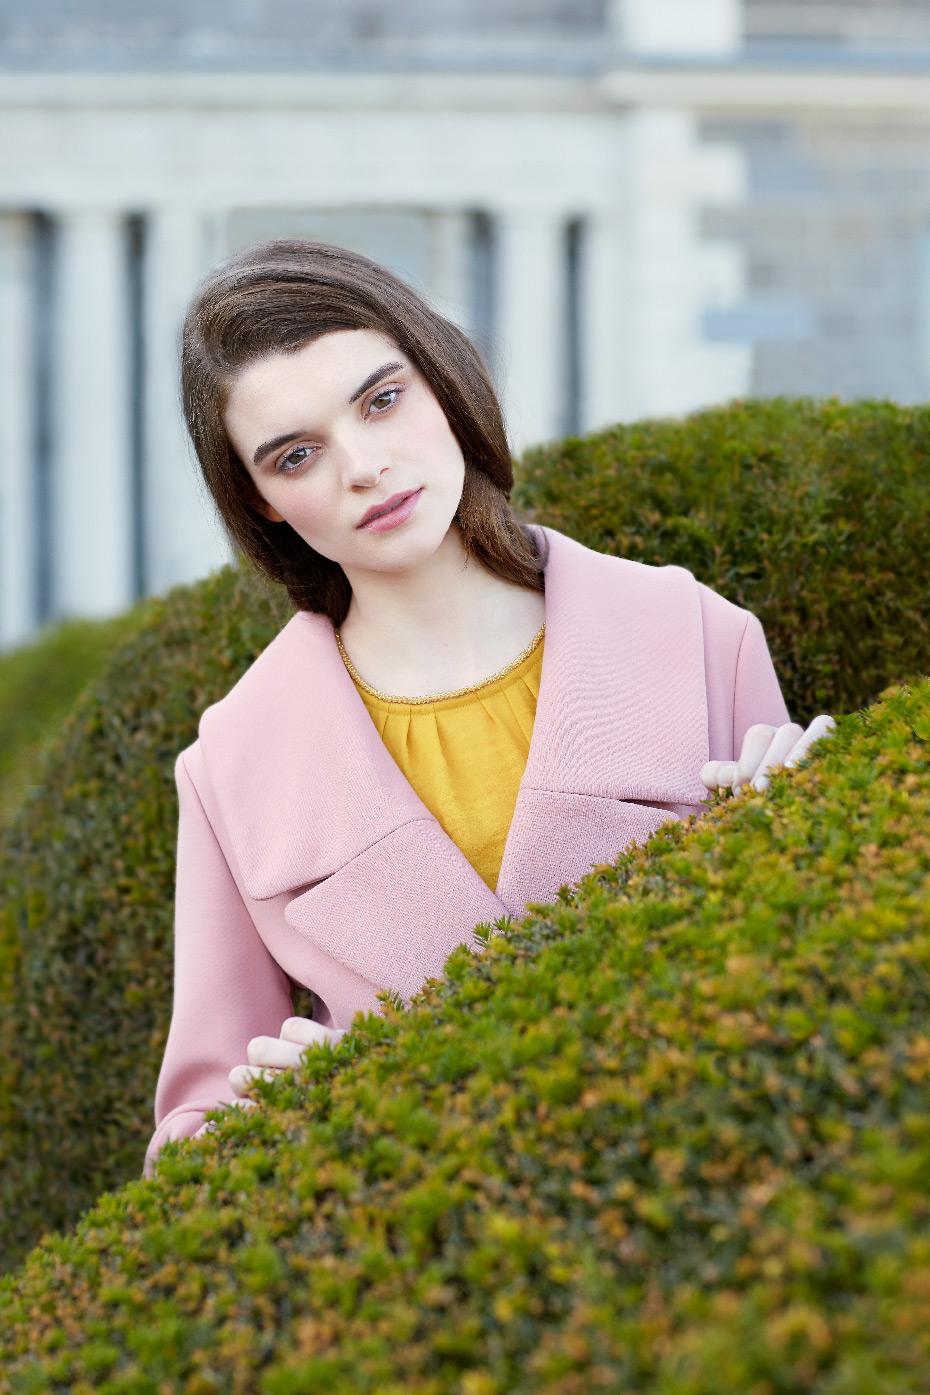 Stacey Van Berkel Photography I Pretty in Pink Fashion Shoot I Mustard Yellow + Blush Pink I Carton House I Kildare, Ireland